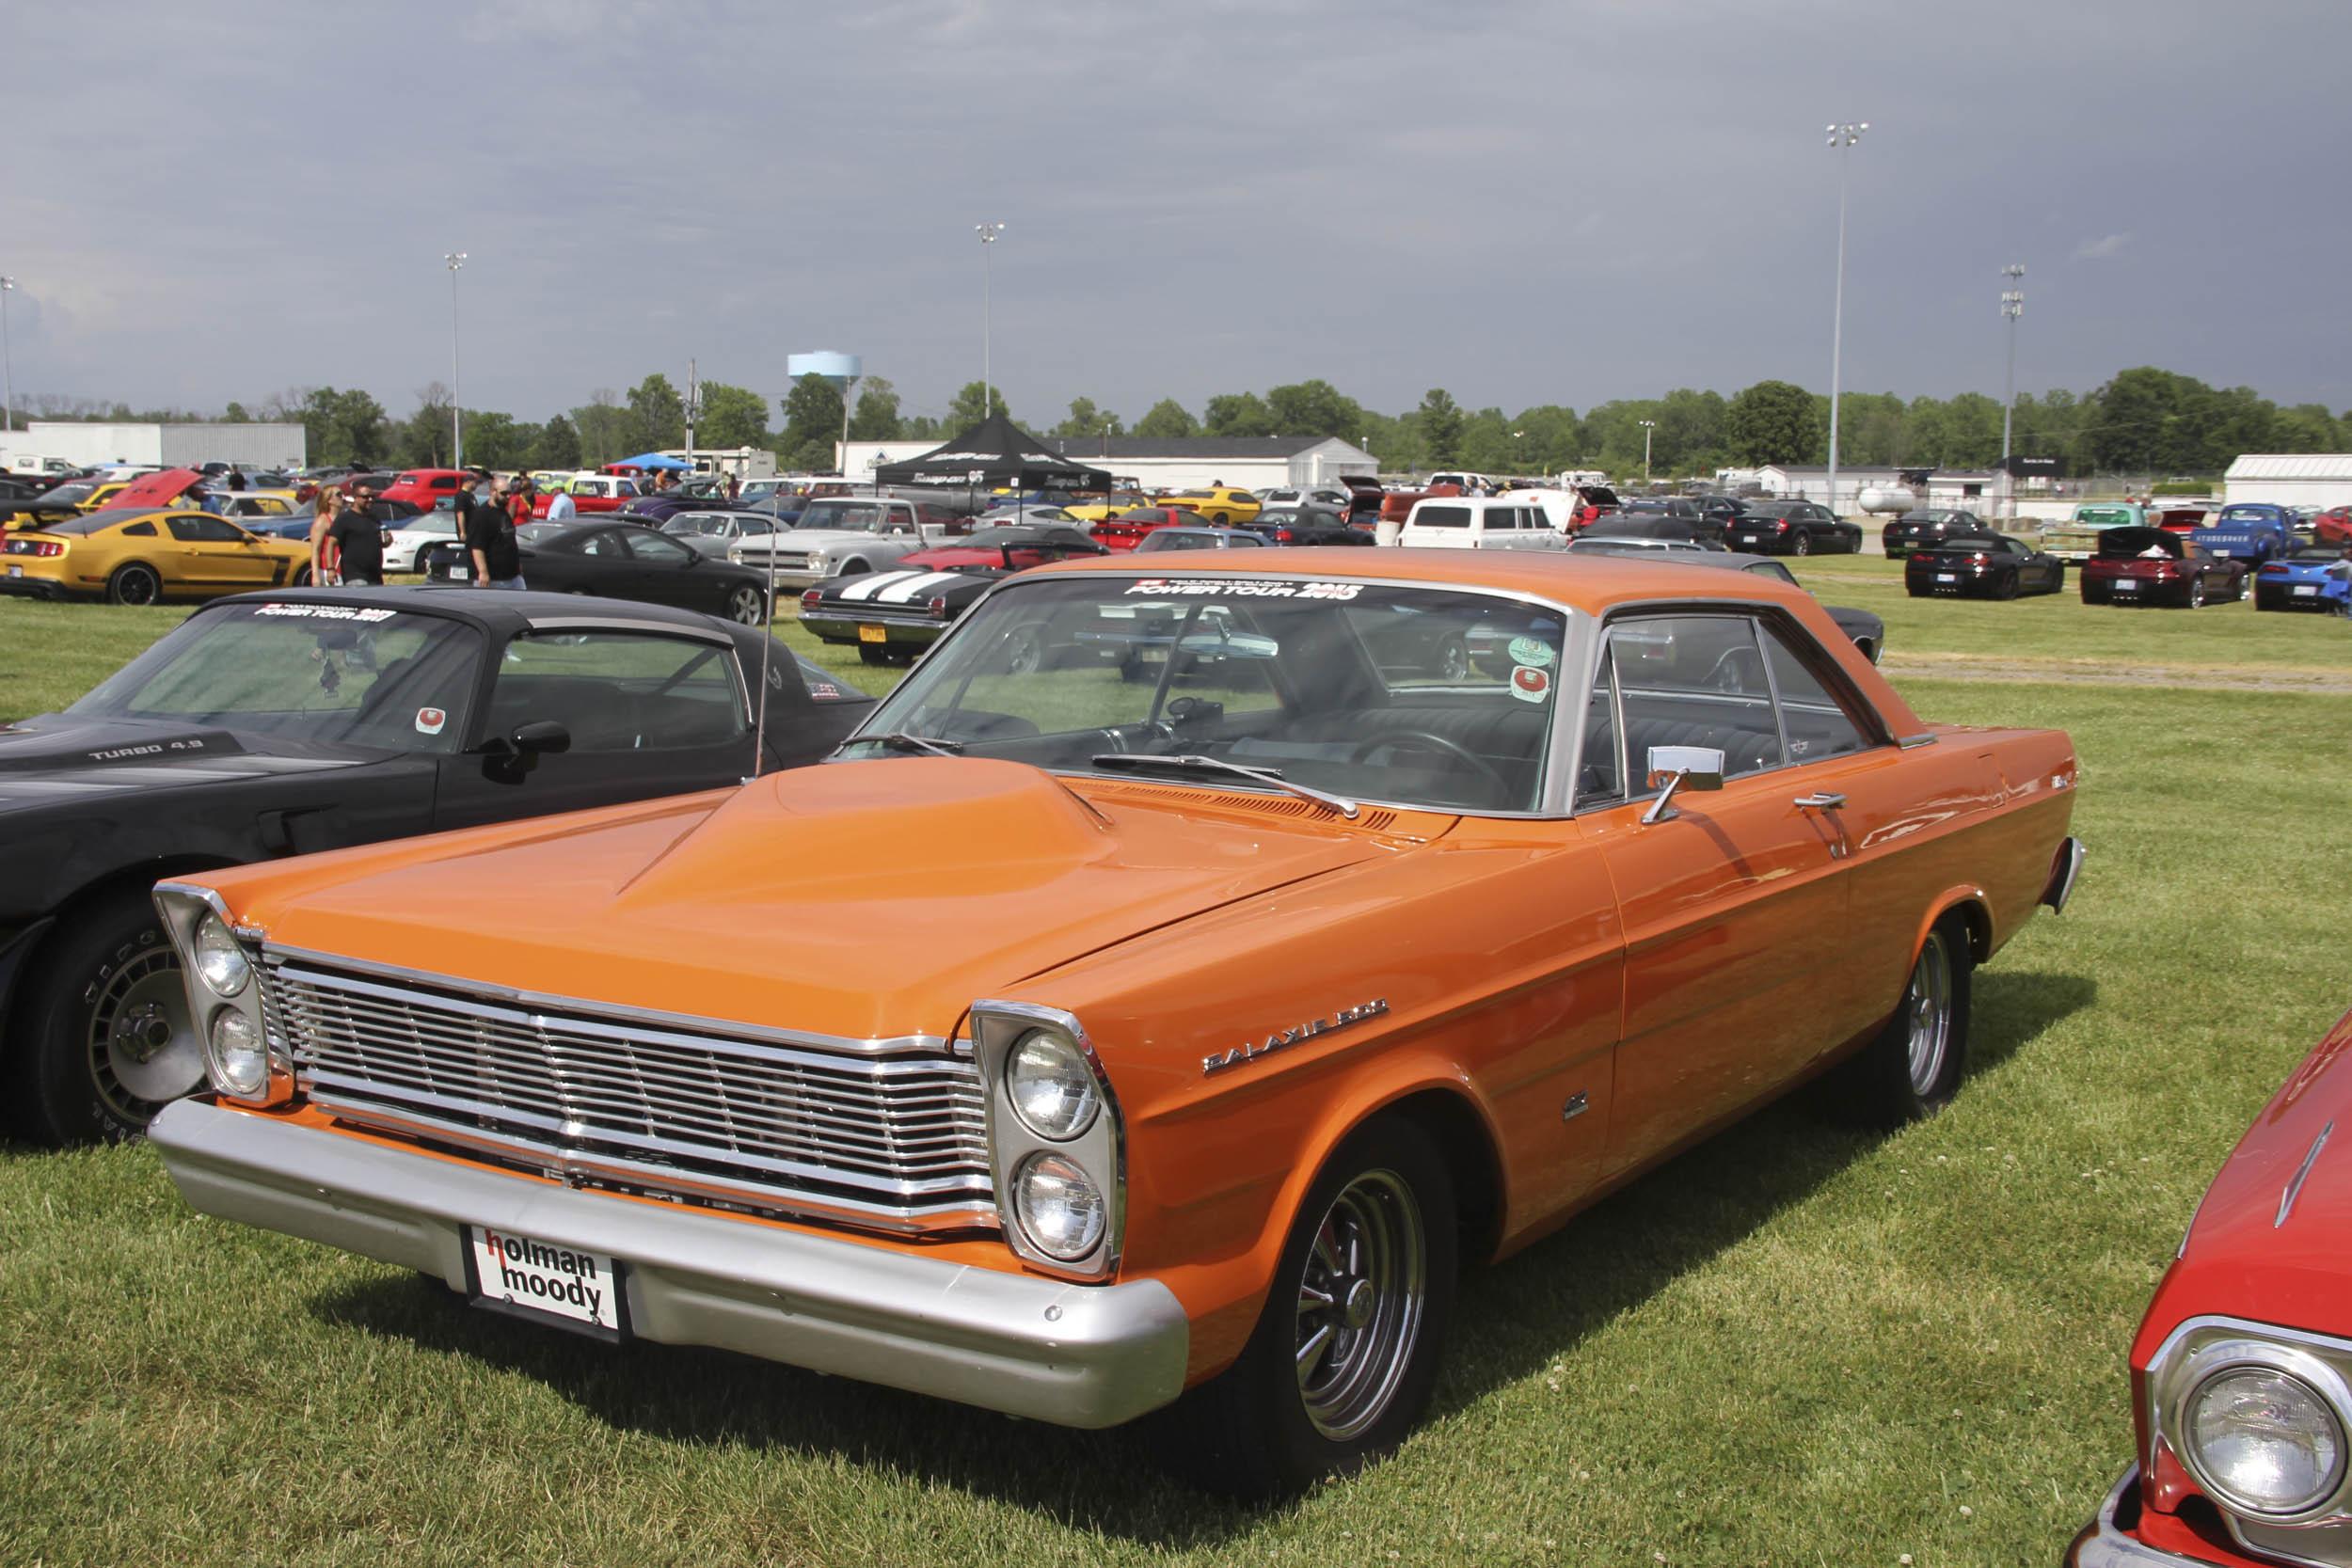 Fords Fairlane Thunderbolts